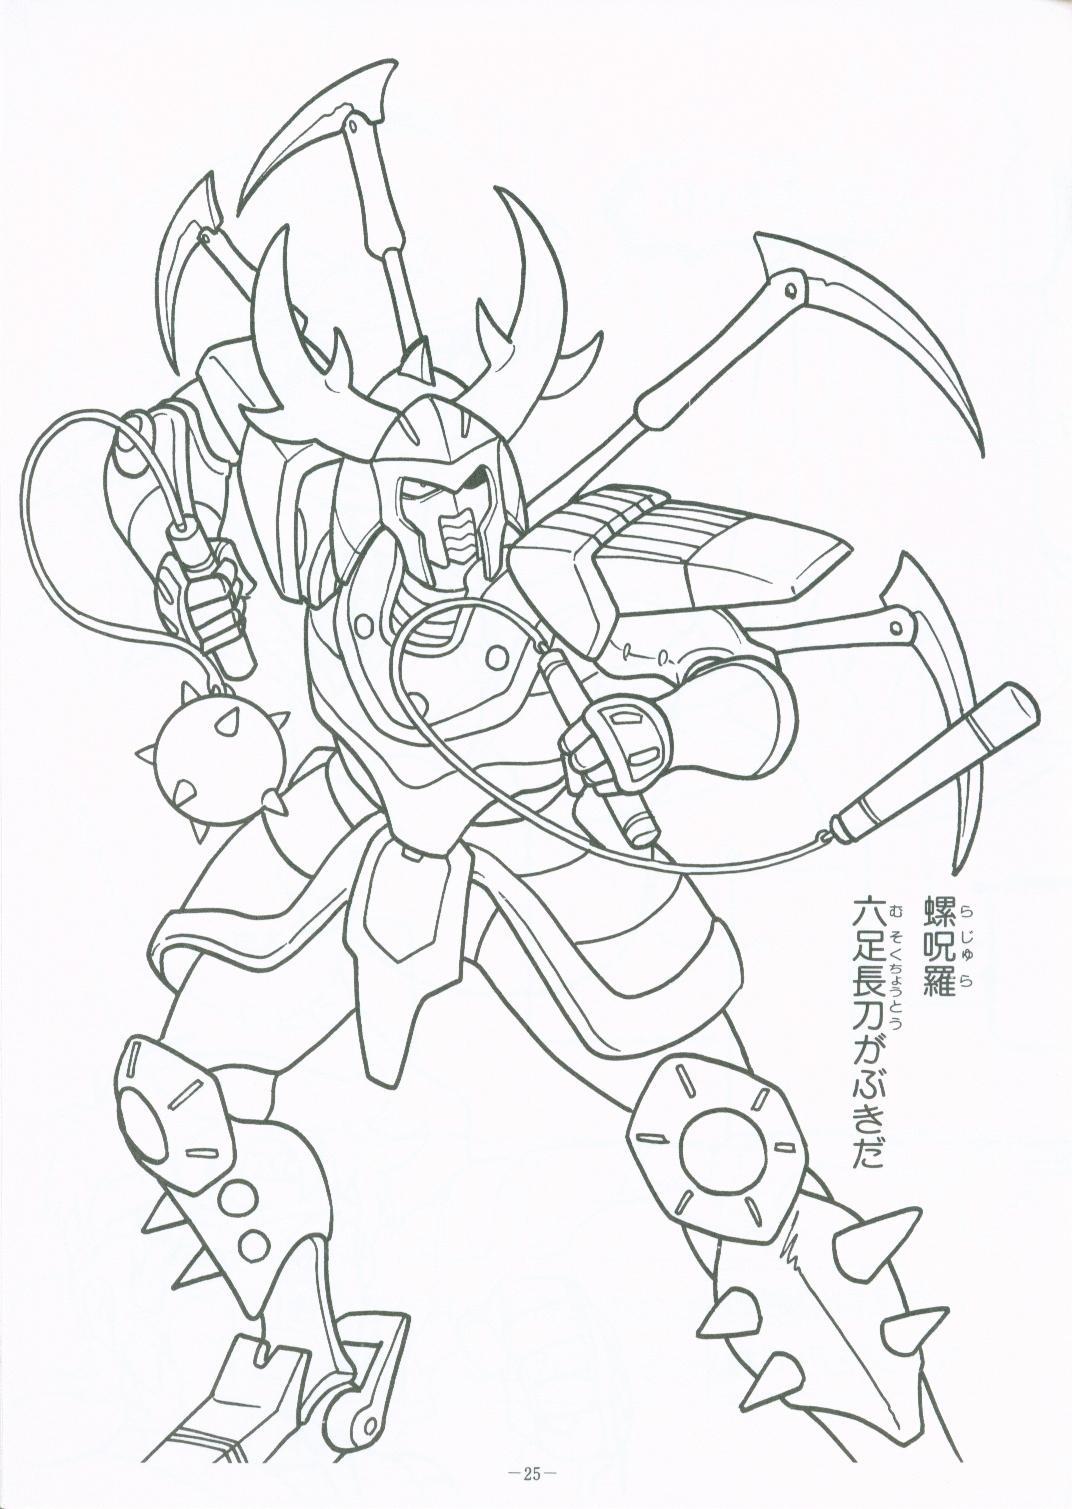 Samurai Warrior Drawing at GetDrawings.com | Free for personal use ...